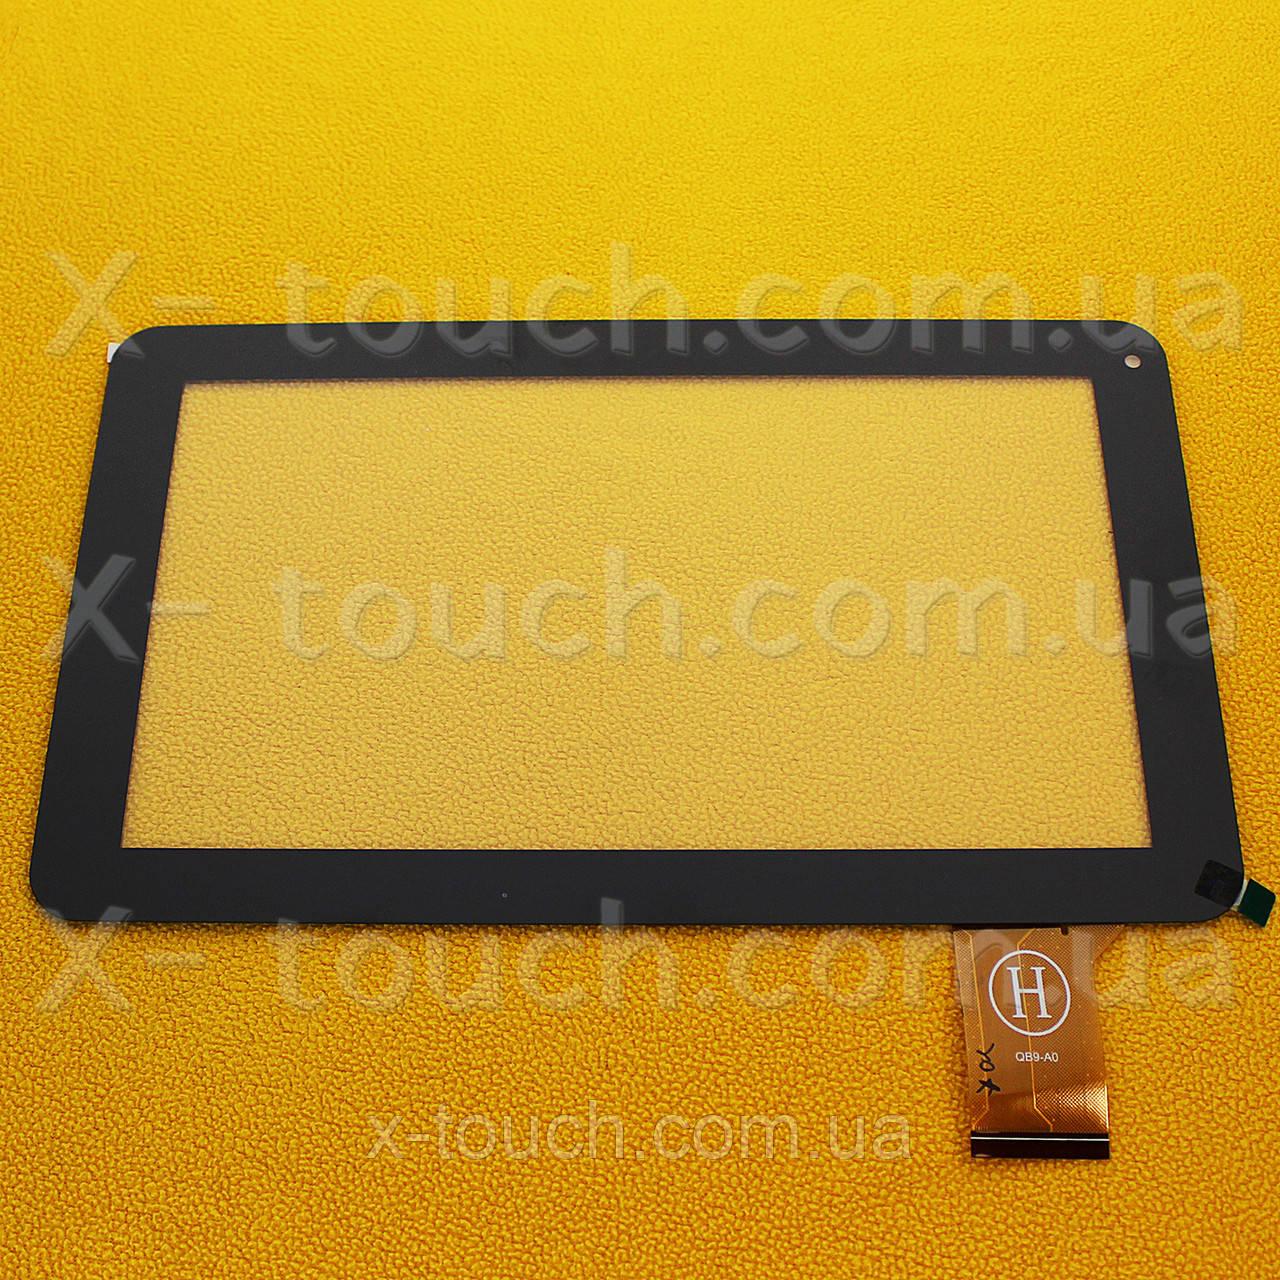 Тачскрин, сенсор  MF-360-090F-3  для планшета